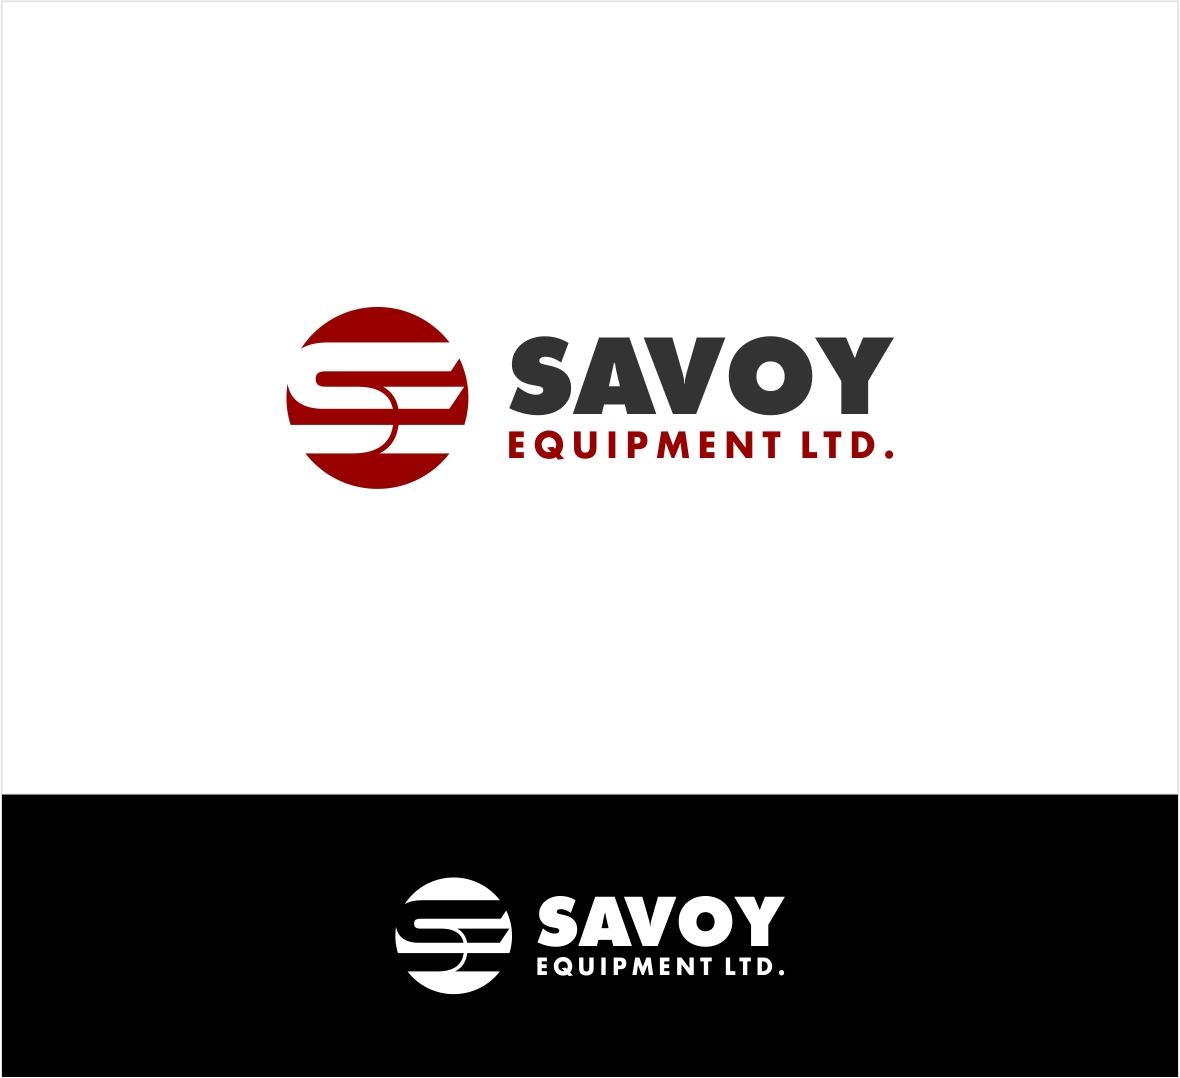 Logo Design by haidu - Entry No. 73 in the Logo Design Contest Inspiring Logo Design for Savoy Equipment Ltd..